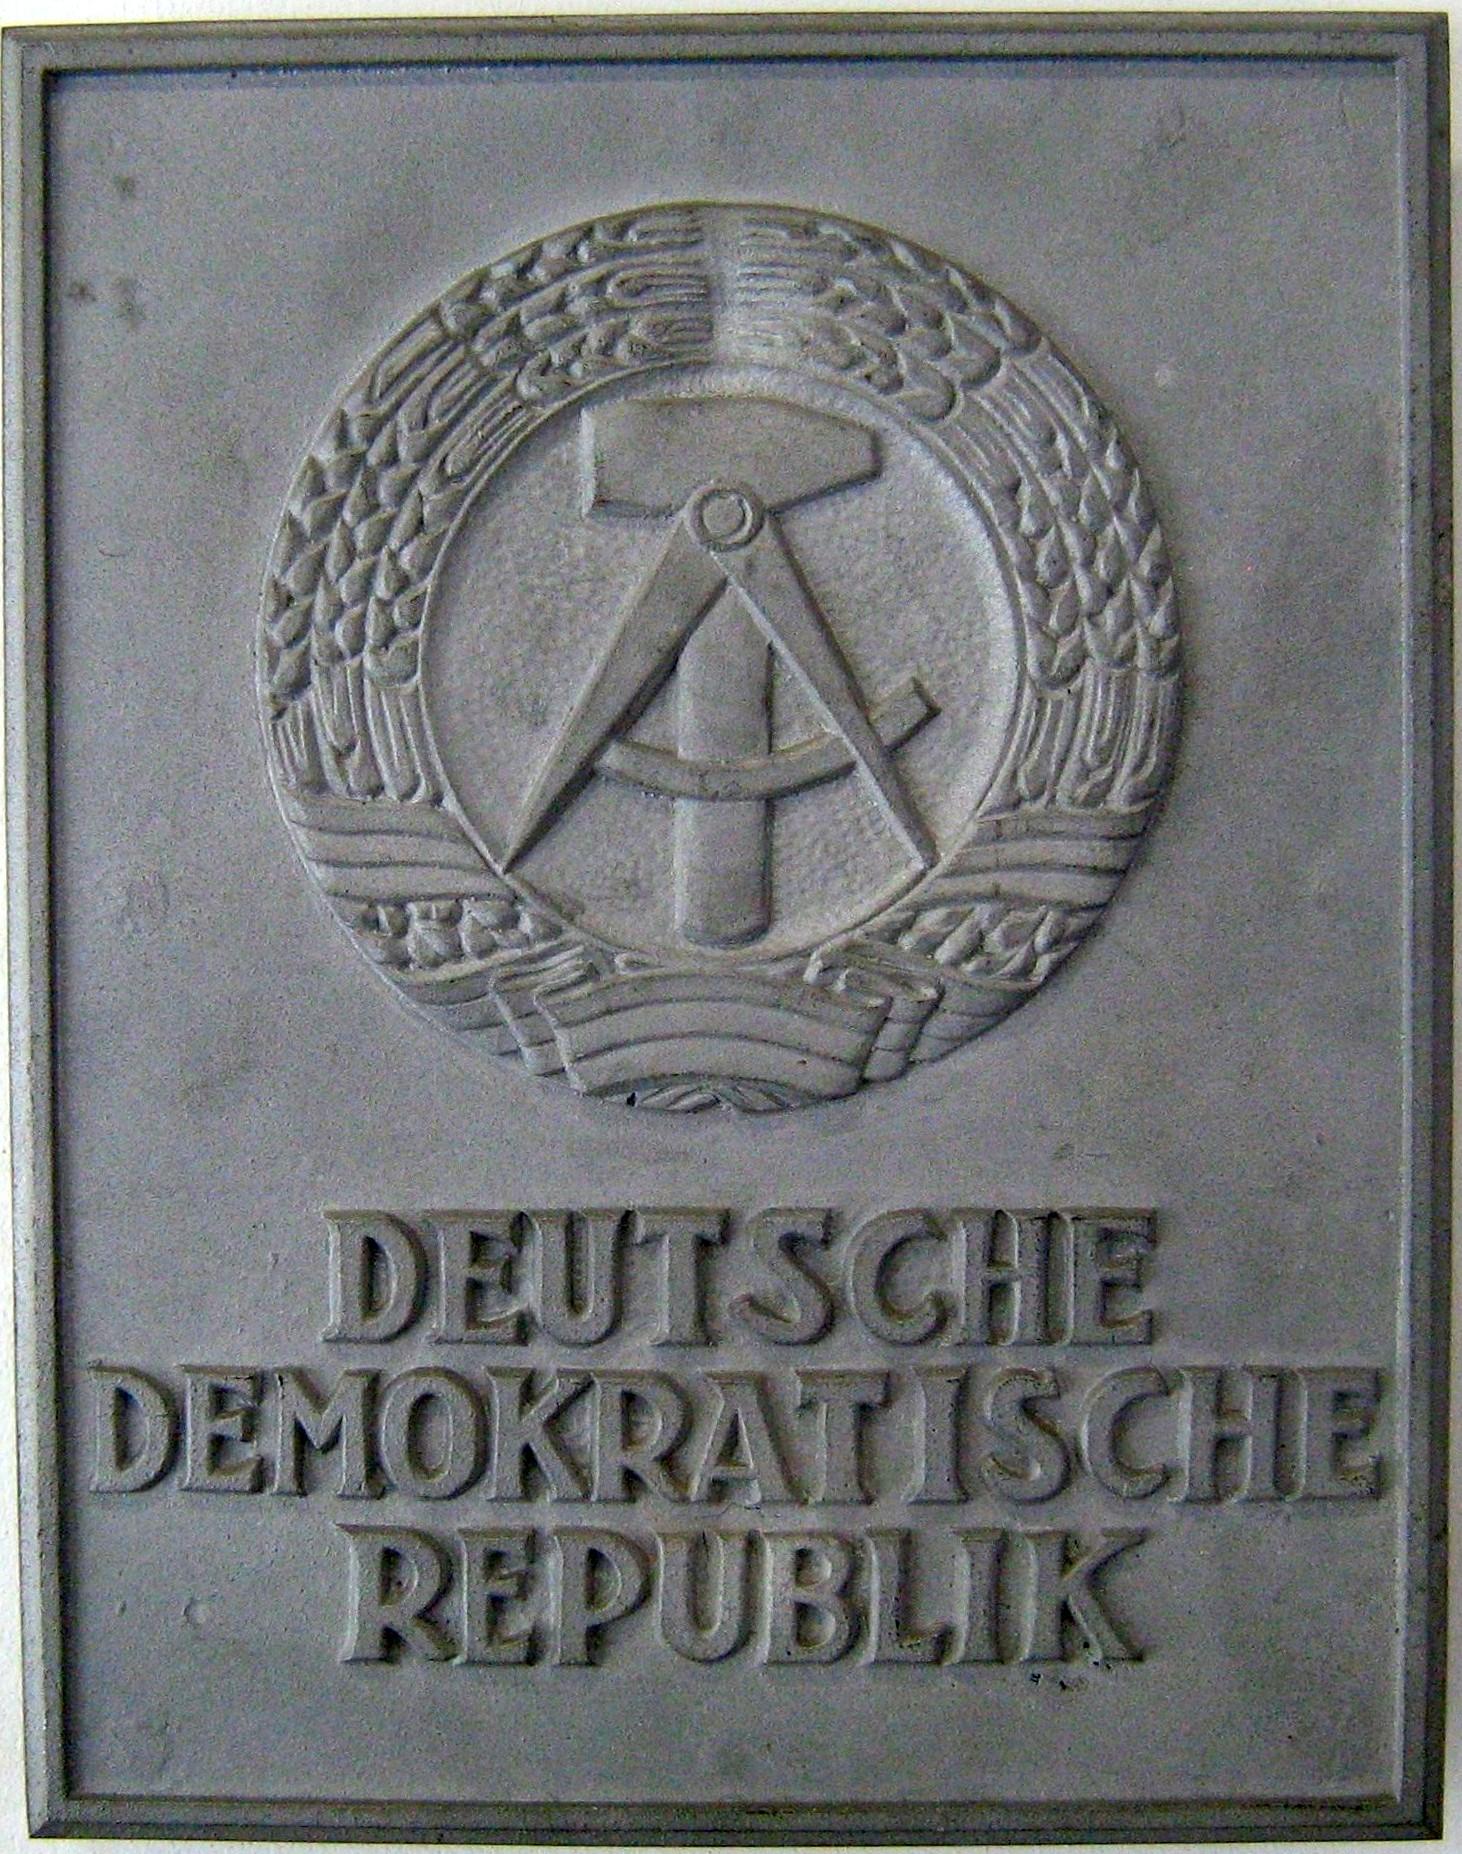 https://upload.wikimedia.org/wikipedia/commons/3/3a/DDR_Tafel.JPG